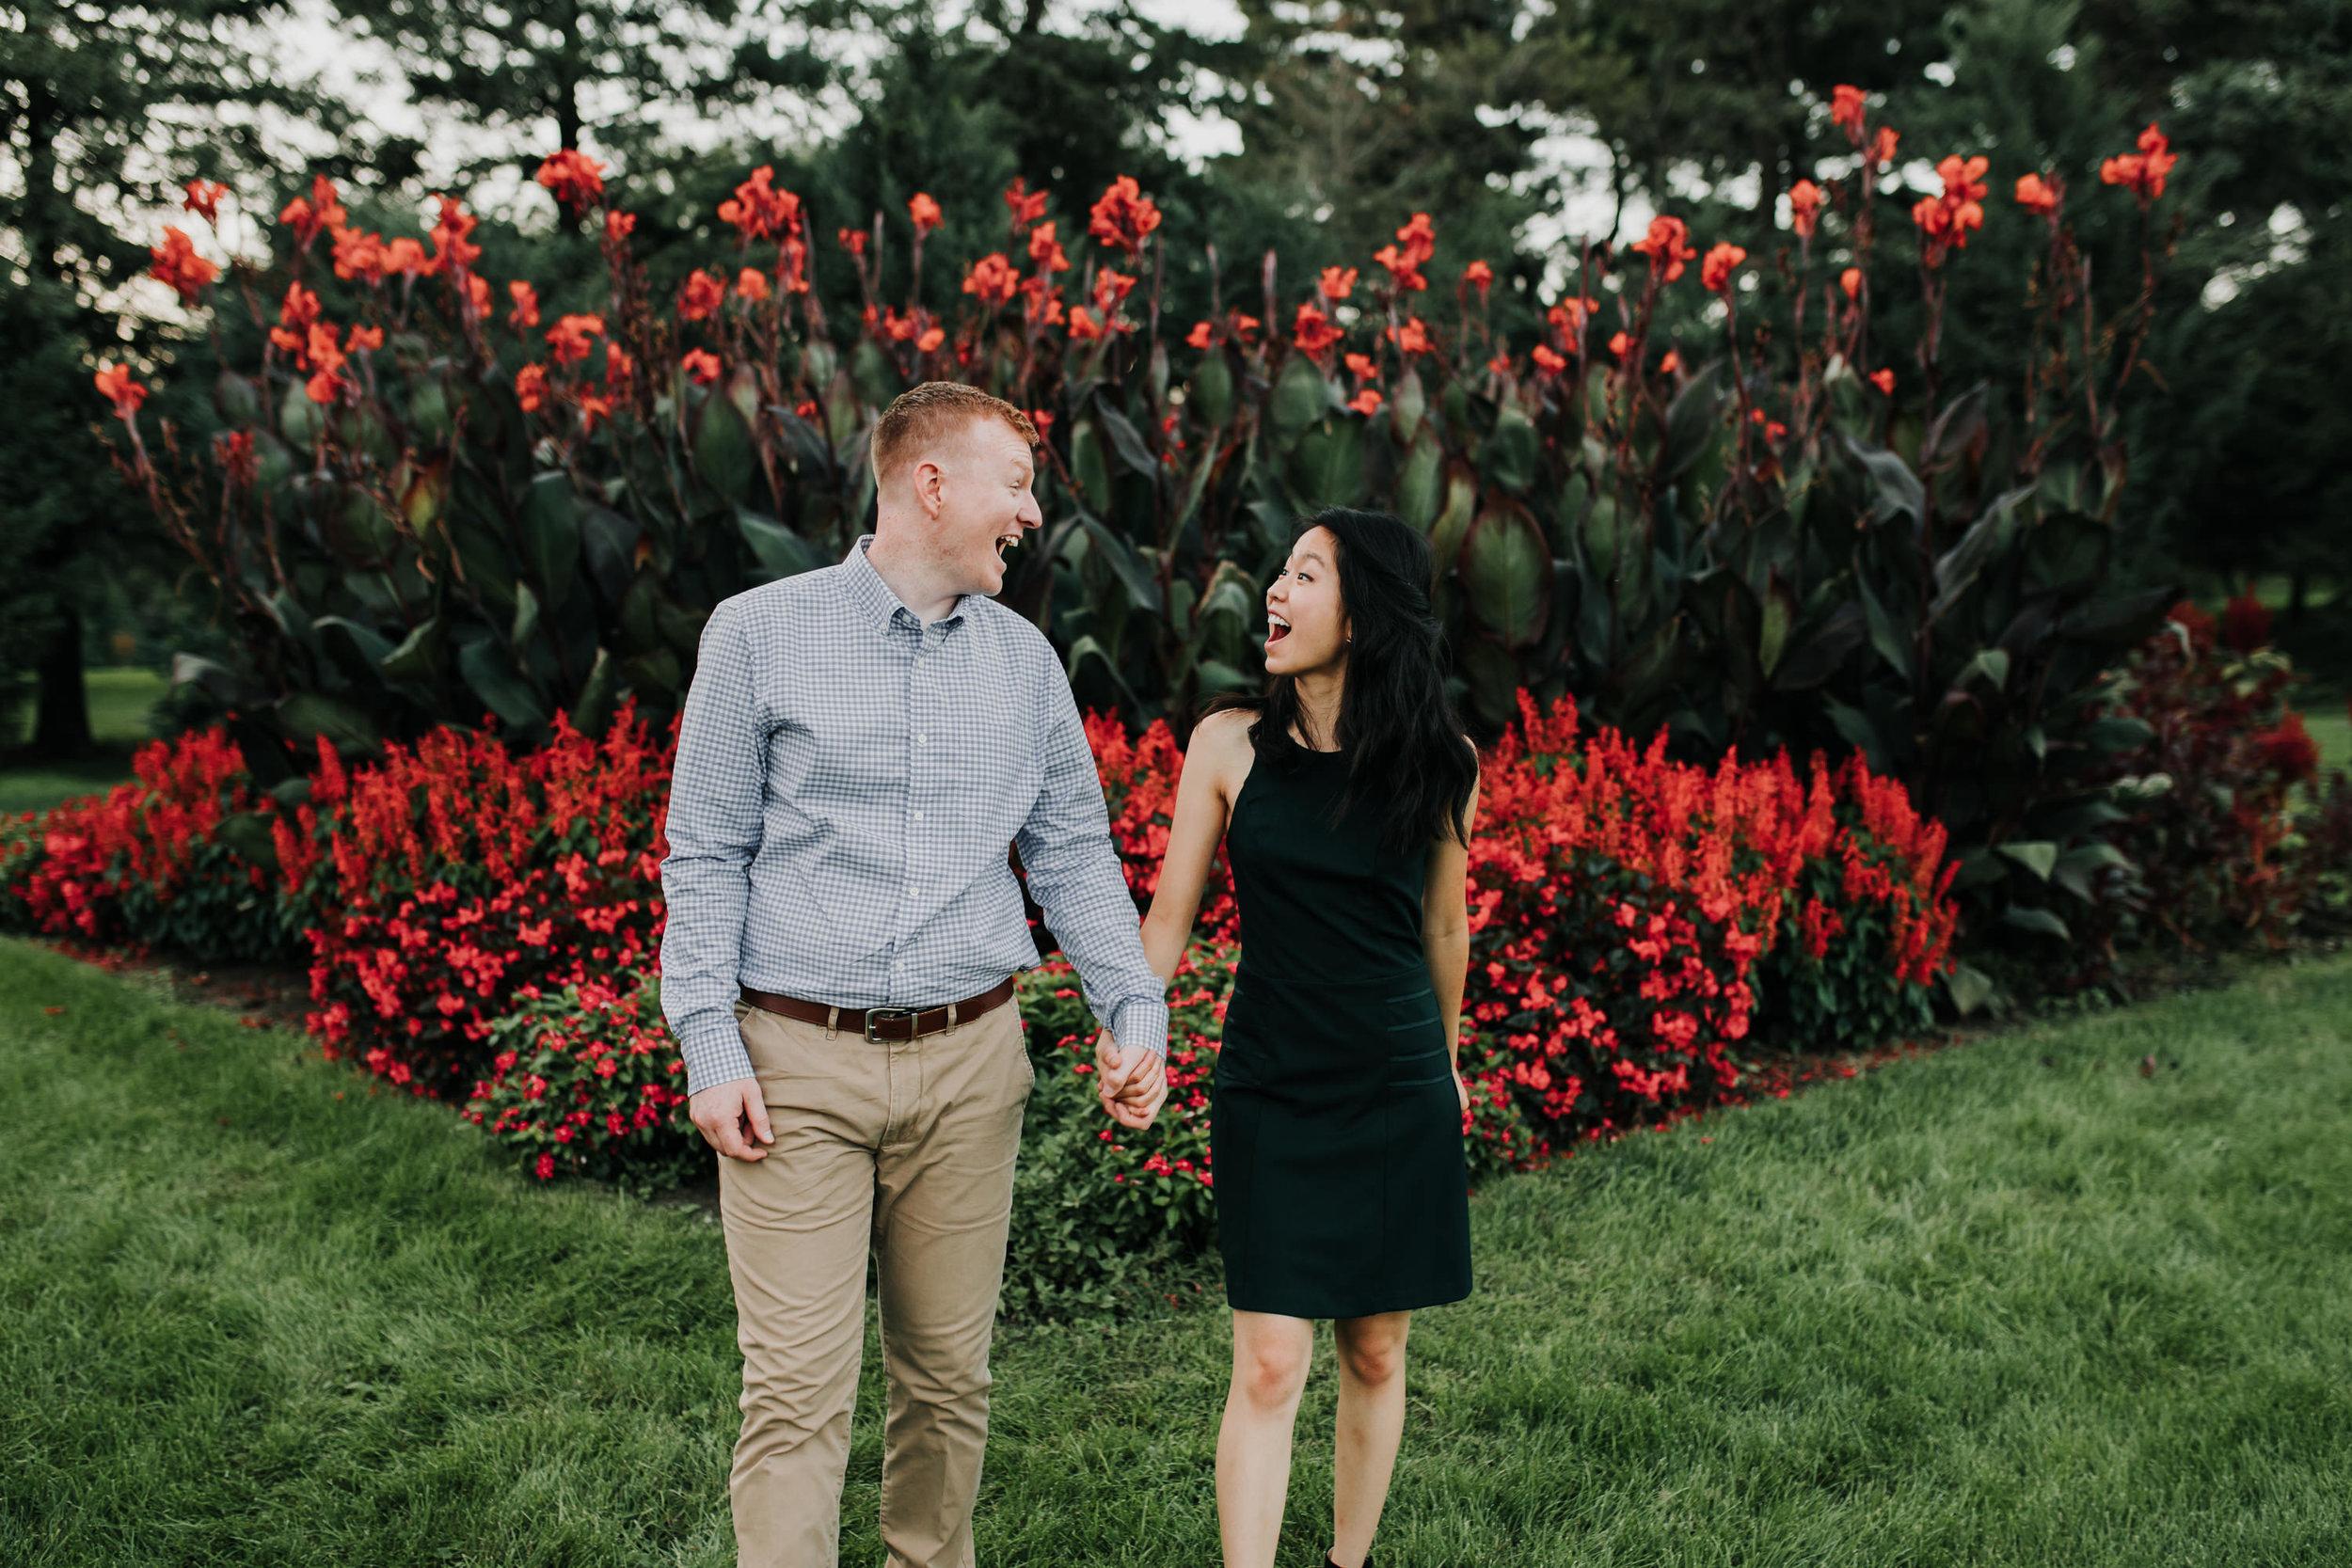 Catherin & Kyle - Married - Nathaniel Jensen Photography - Omaha Nebraska Wedding Photograper - Memorial Park - Joslyn Castle Engagement Session-72.jpg